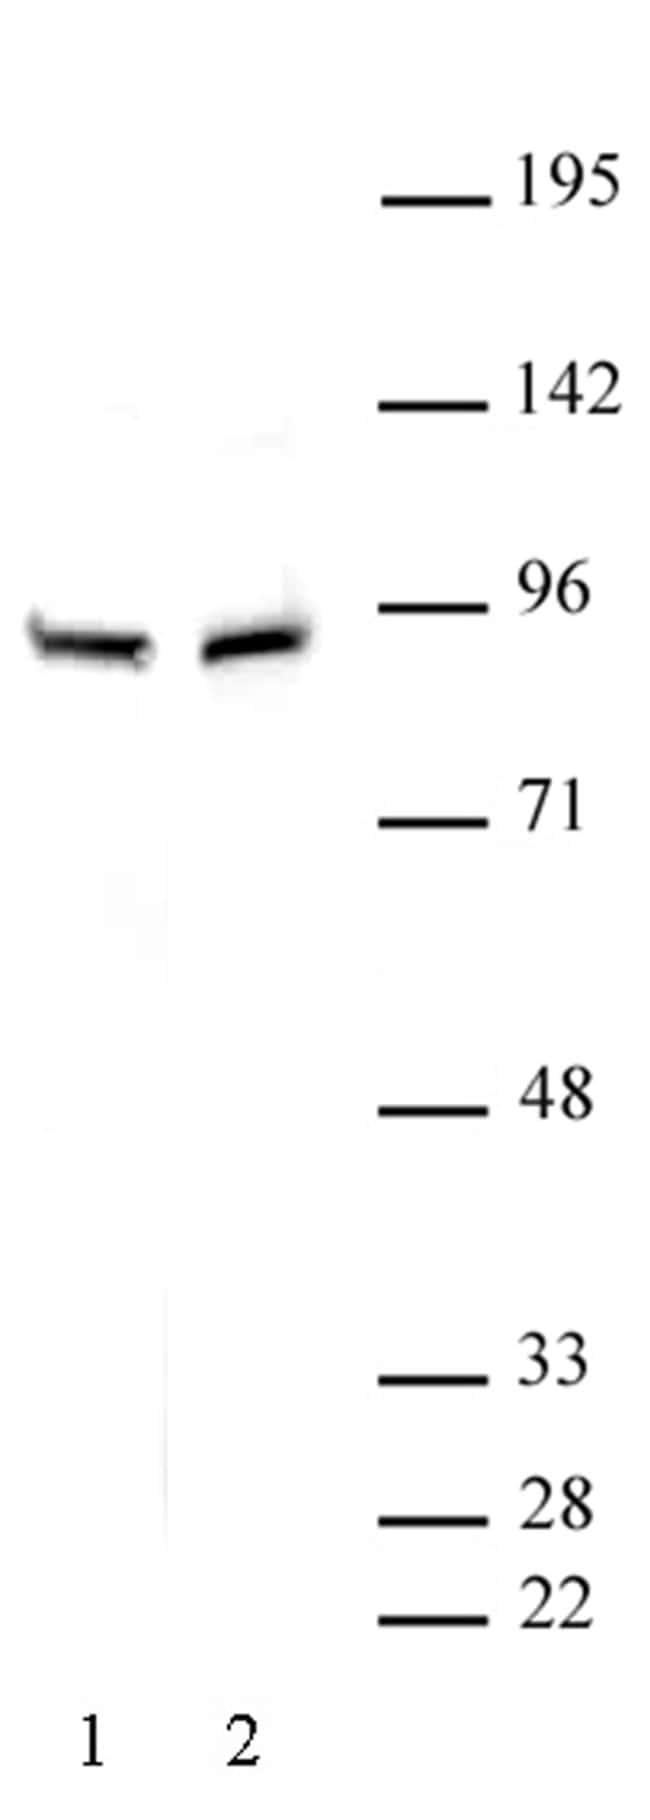 beta-Catenin Rabbit anti-Human, Unconjugated, Polyclonal, Active Motif:Antibodies:Primary